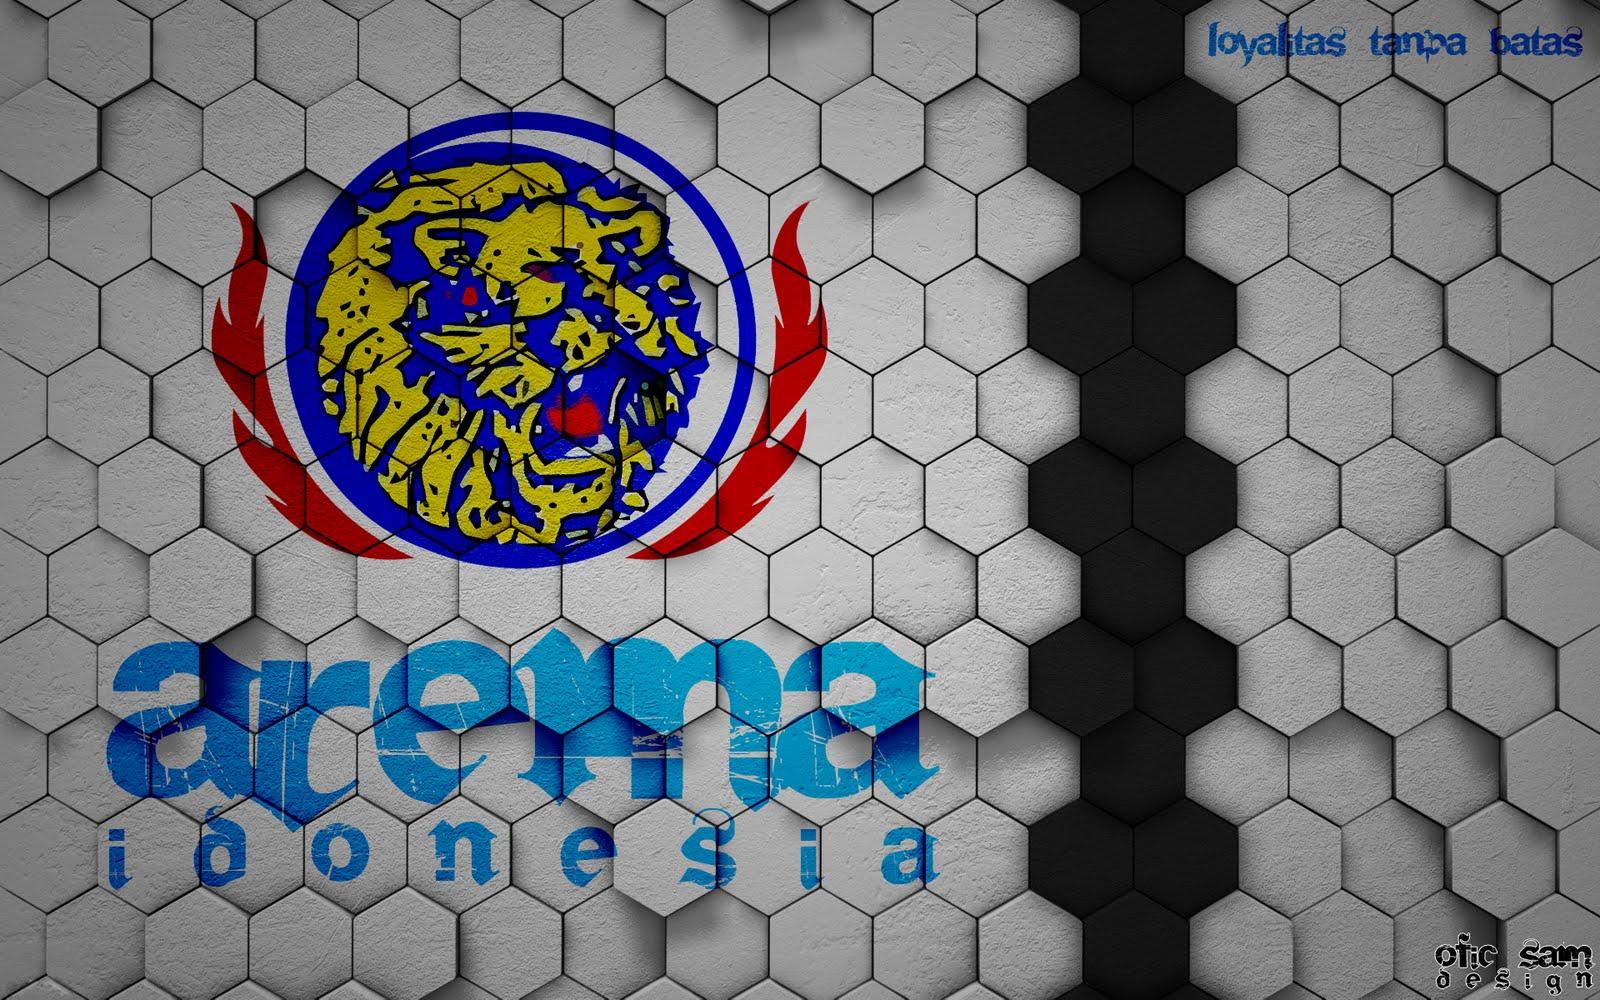 http://1.bp.blogspot.com/-_K_DBYYLYOY/TglqmwGknFI/AAAAAAAAAUc/GmpXOmWyPBo/s1600/wallpaper+arema+indonesia+2011+by+%2528ofic+sam%2529+fb..+boy_gassipers%2540yahoo.co.id+1.jpg